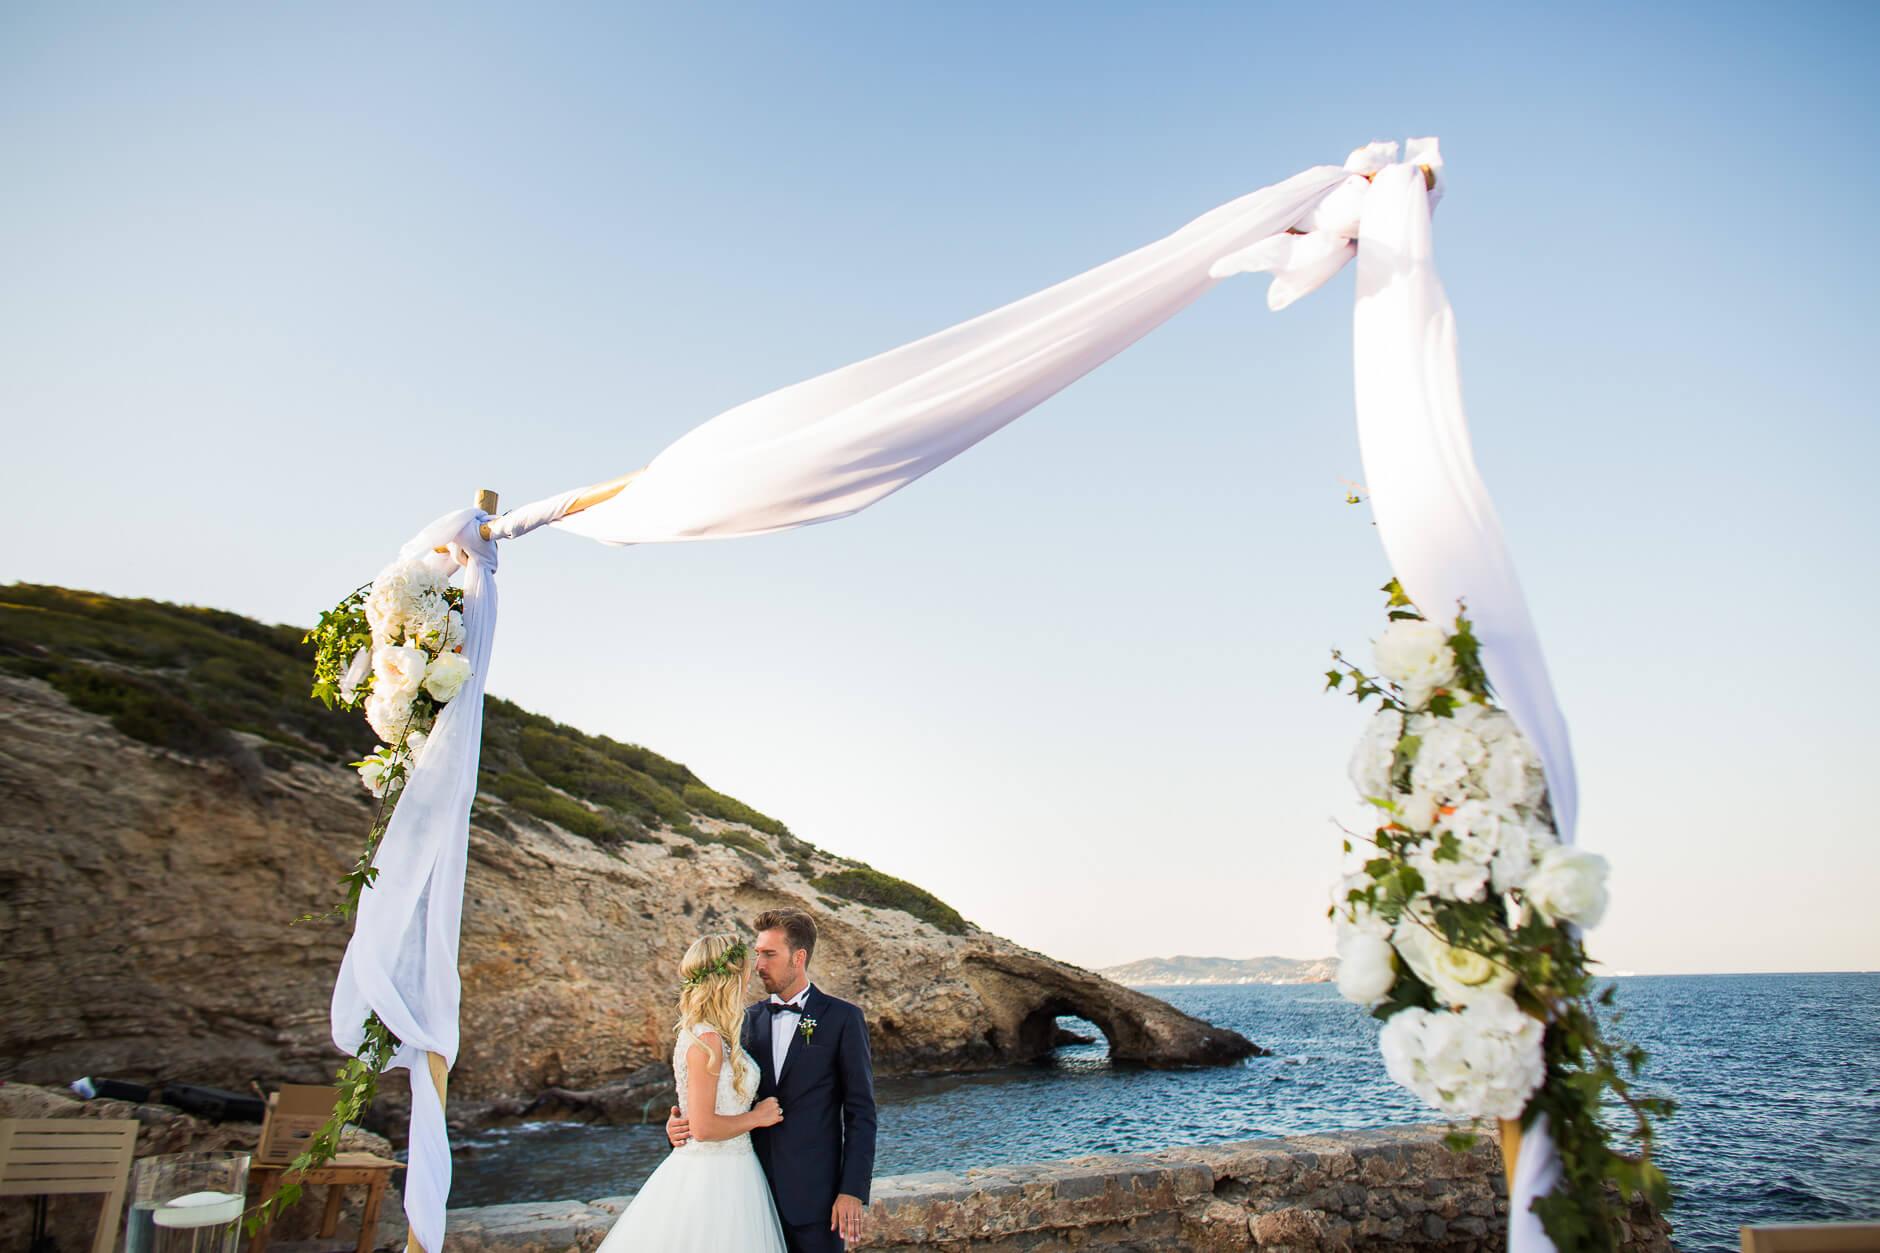 matrimonio in spiaggia ibiza